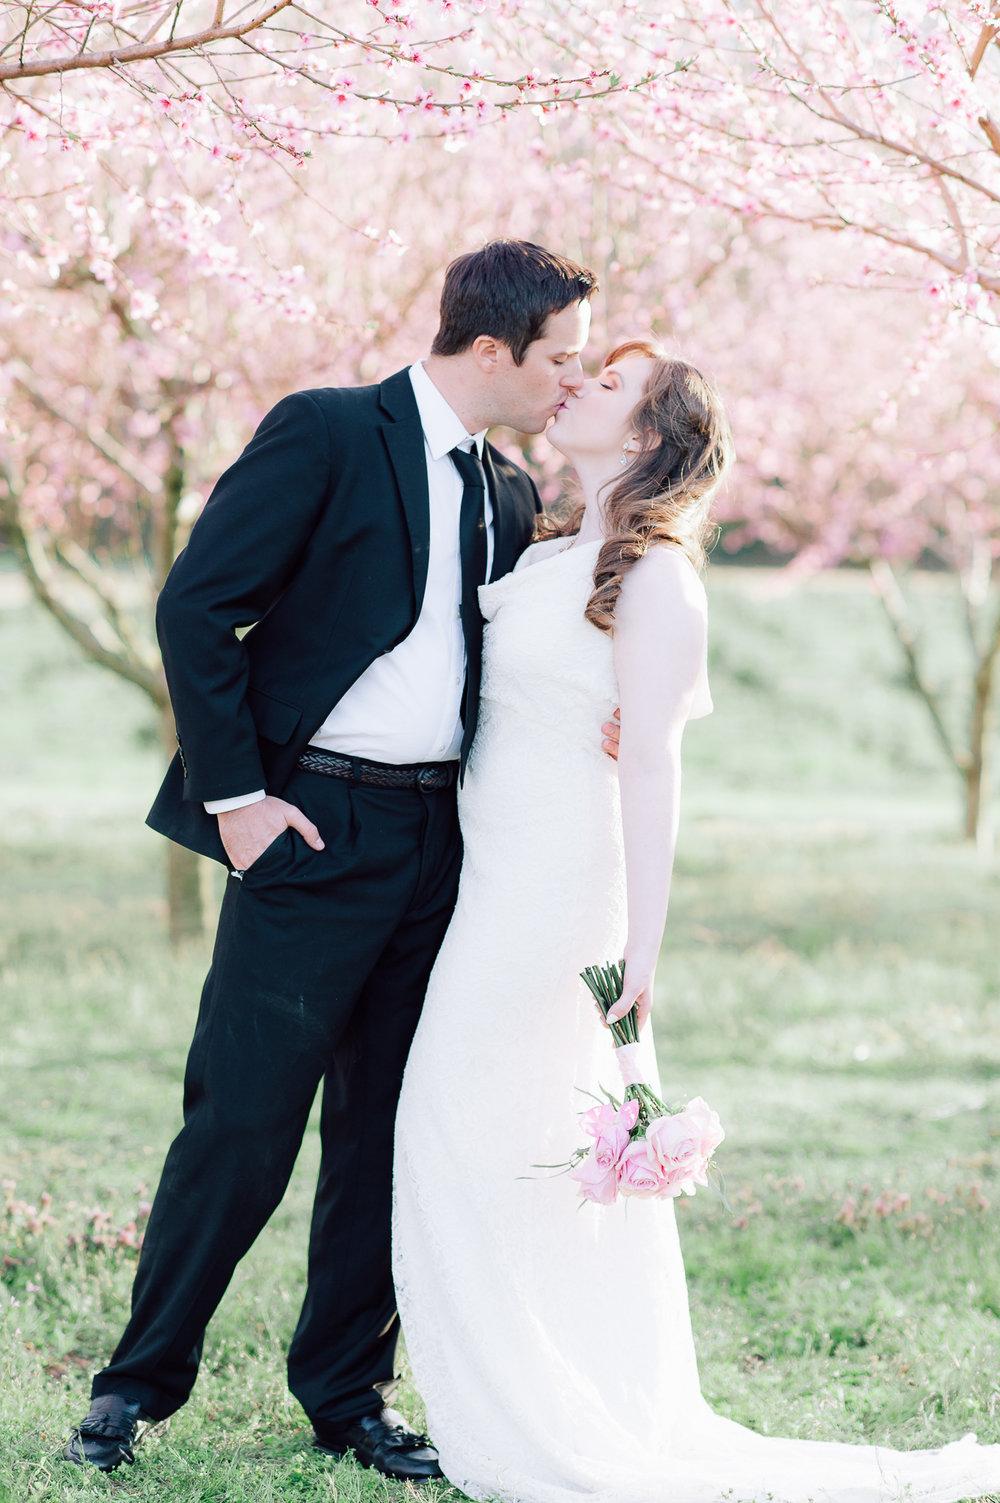 springwedding_cherryblossoms_virginiaphotographer_youseephotography_styledshoot (572).jpg